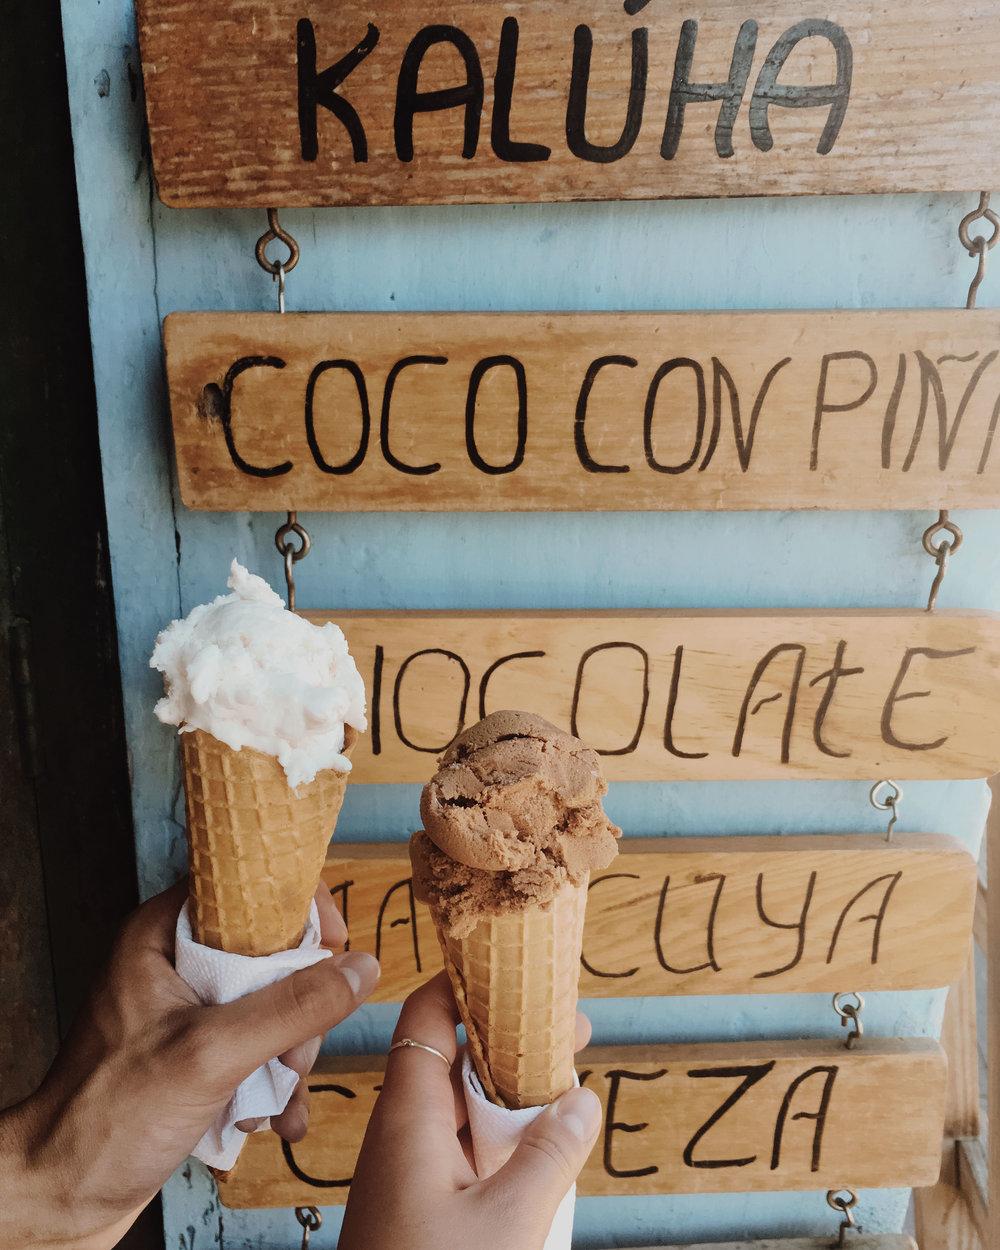 coconut & chocolate ice cream back in antigua. spilled my chocolate ice cream all over my white dress.